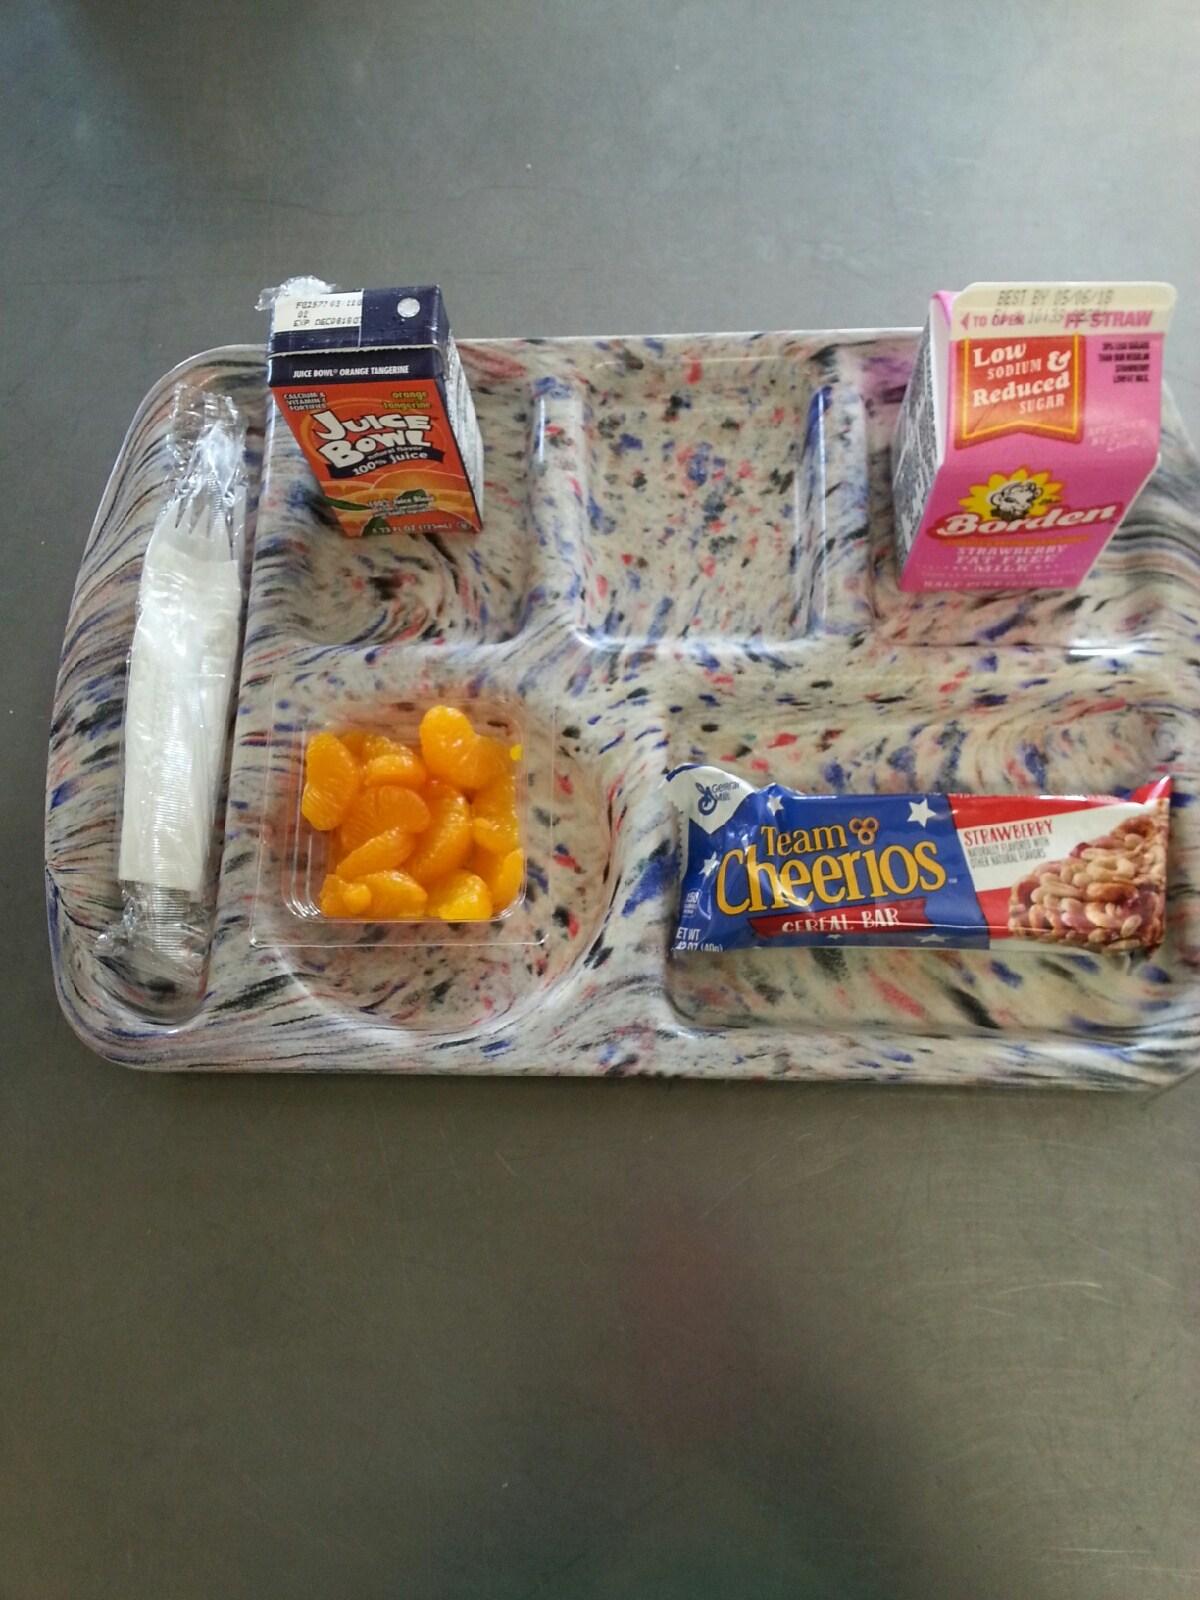 Cheerios Cereal Bar